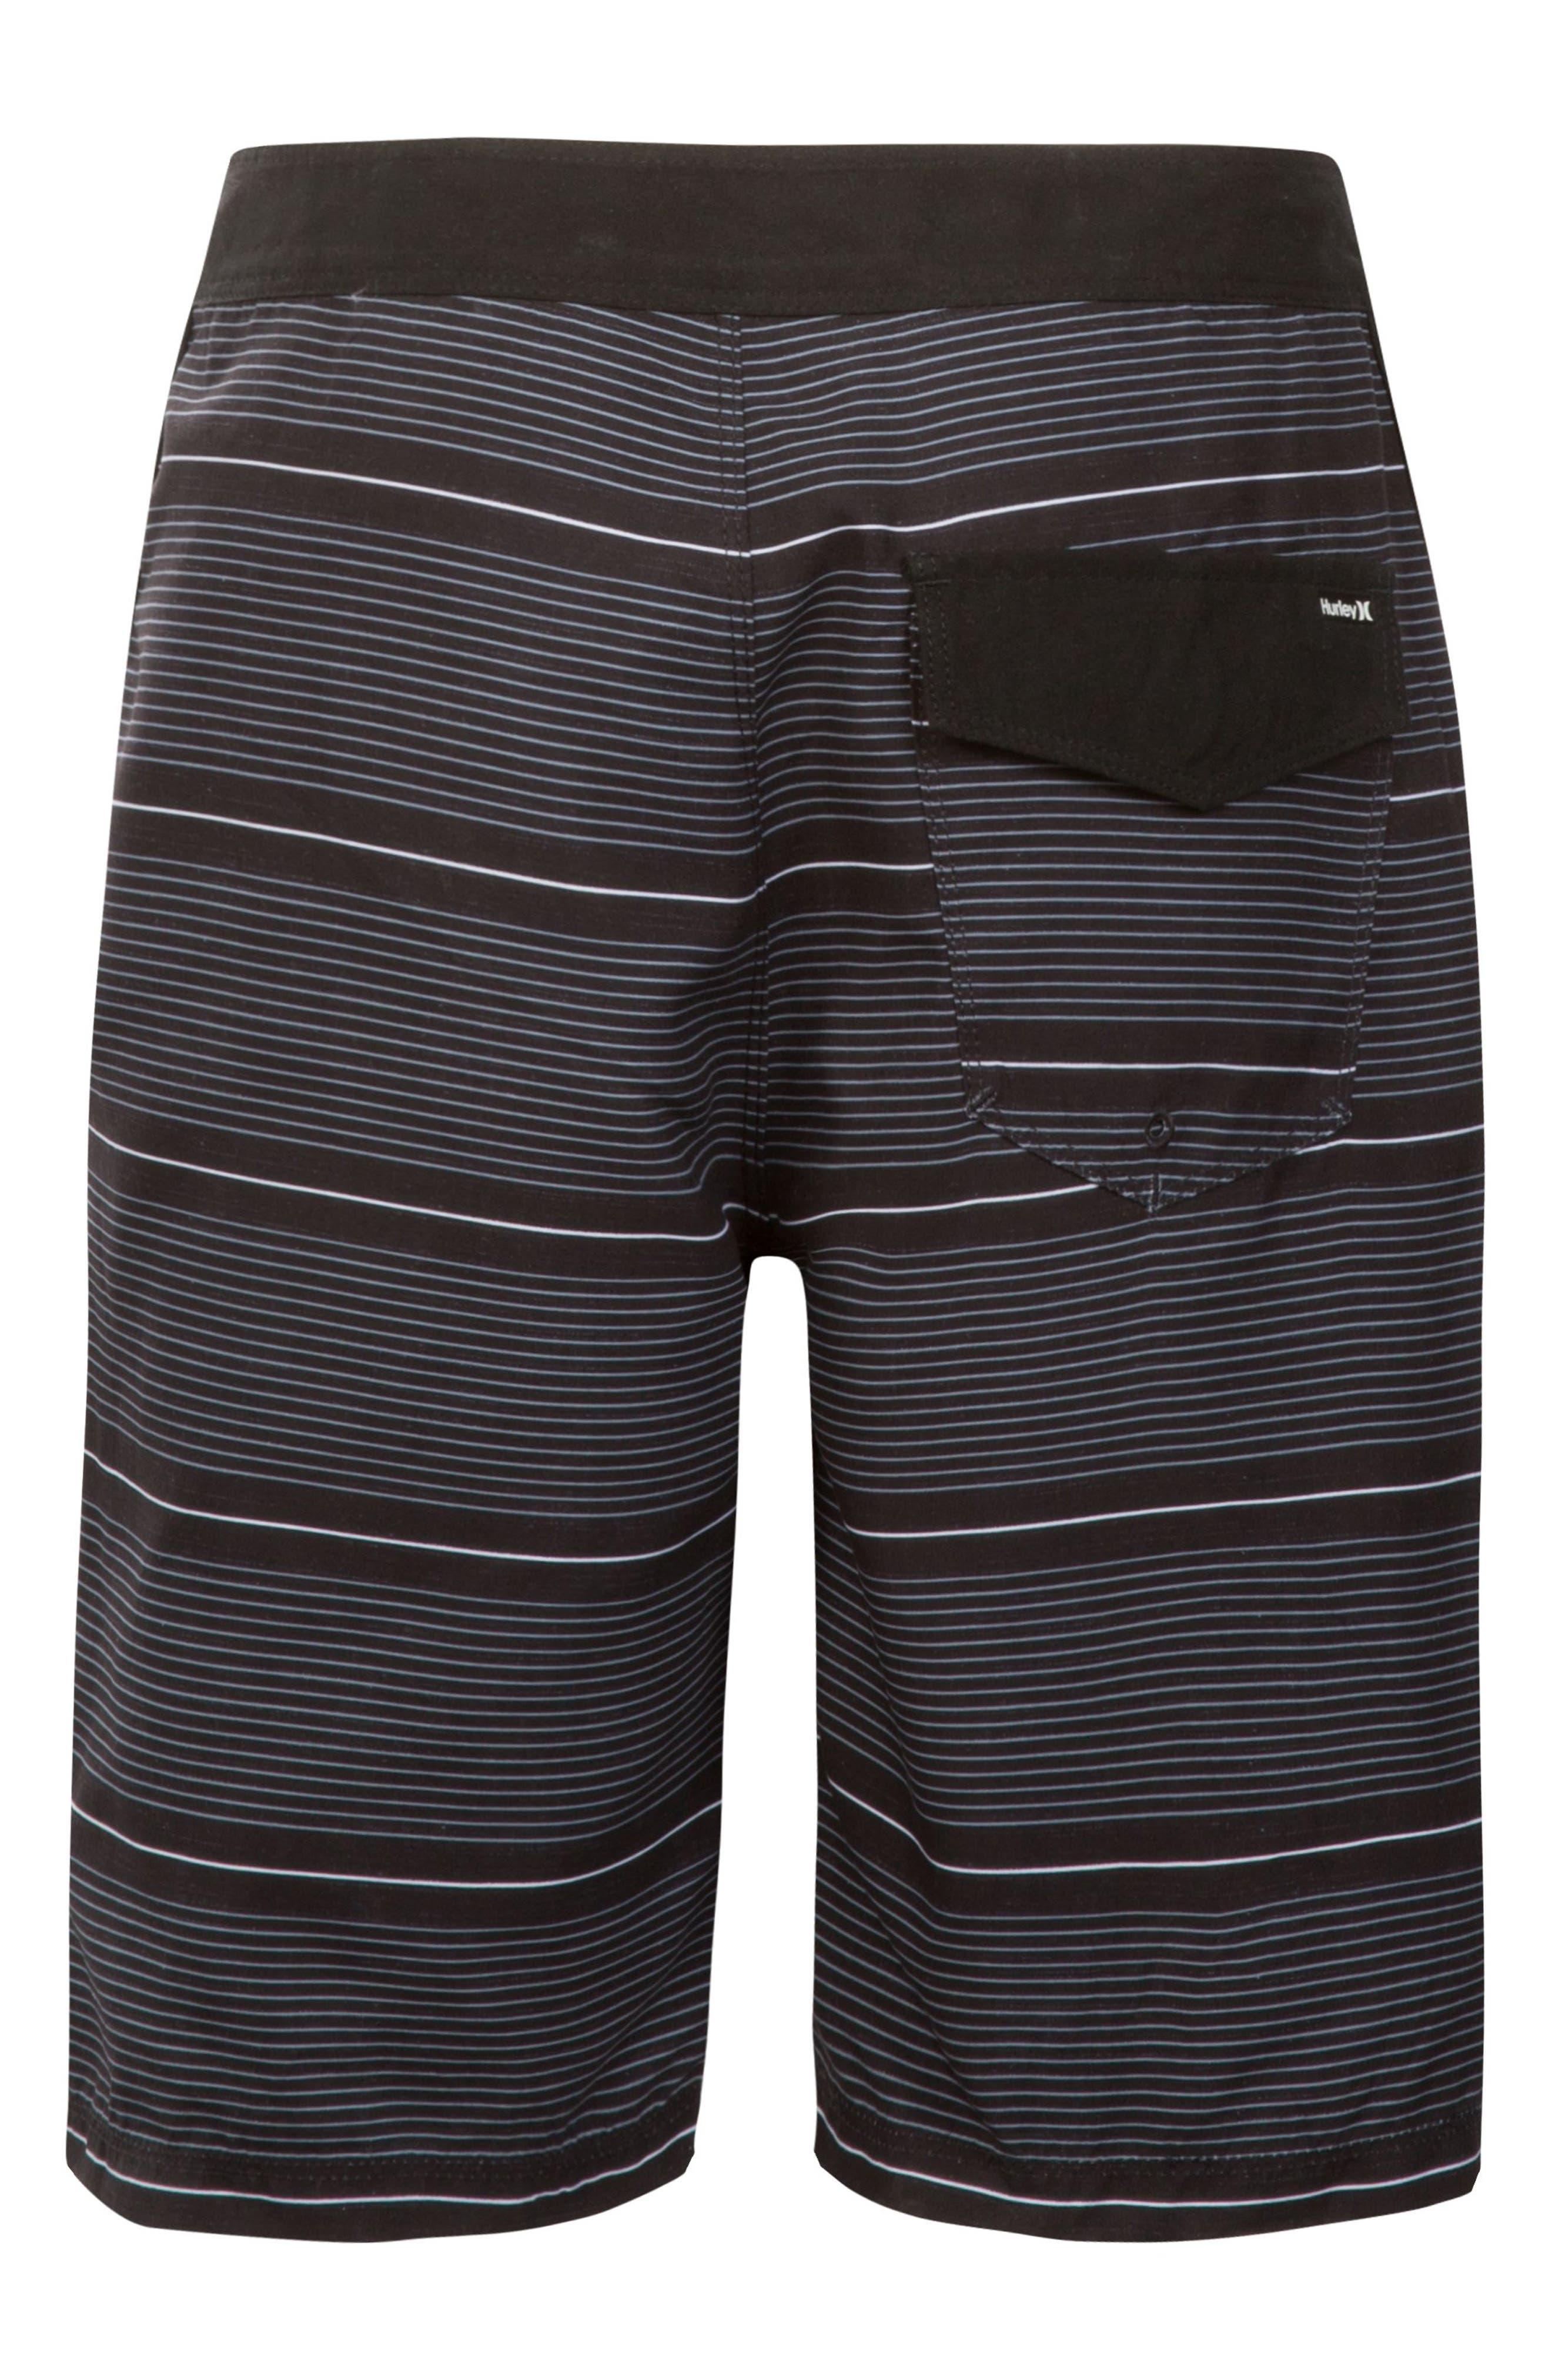 HURLEY, Shoreline Board Shorts, Alternate thumbnail 2, color, BLACK